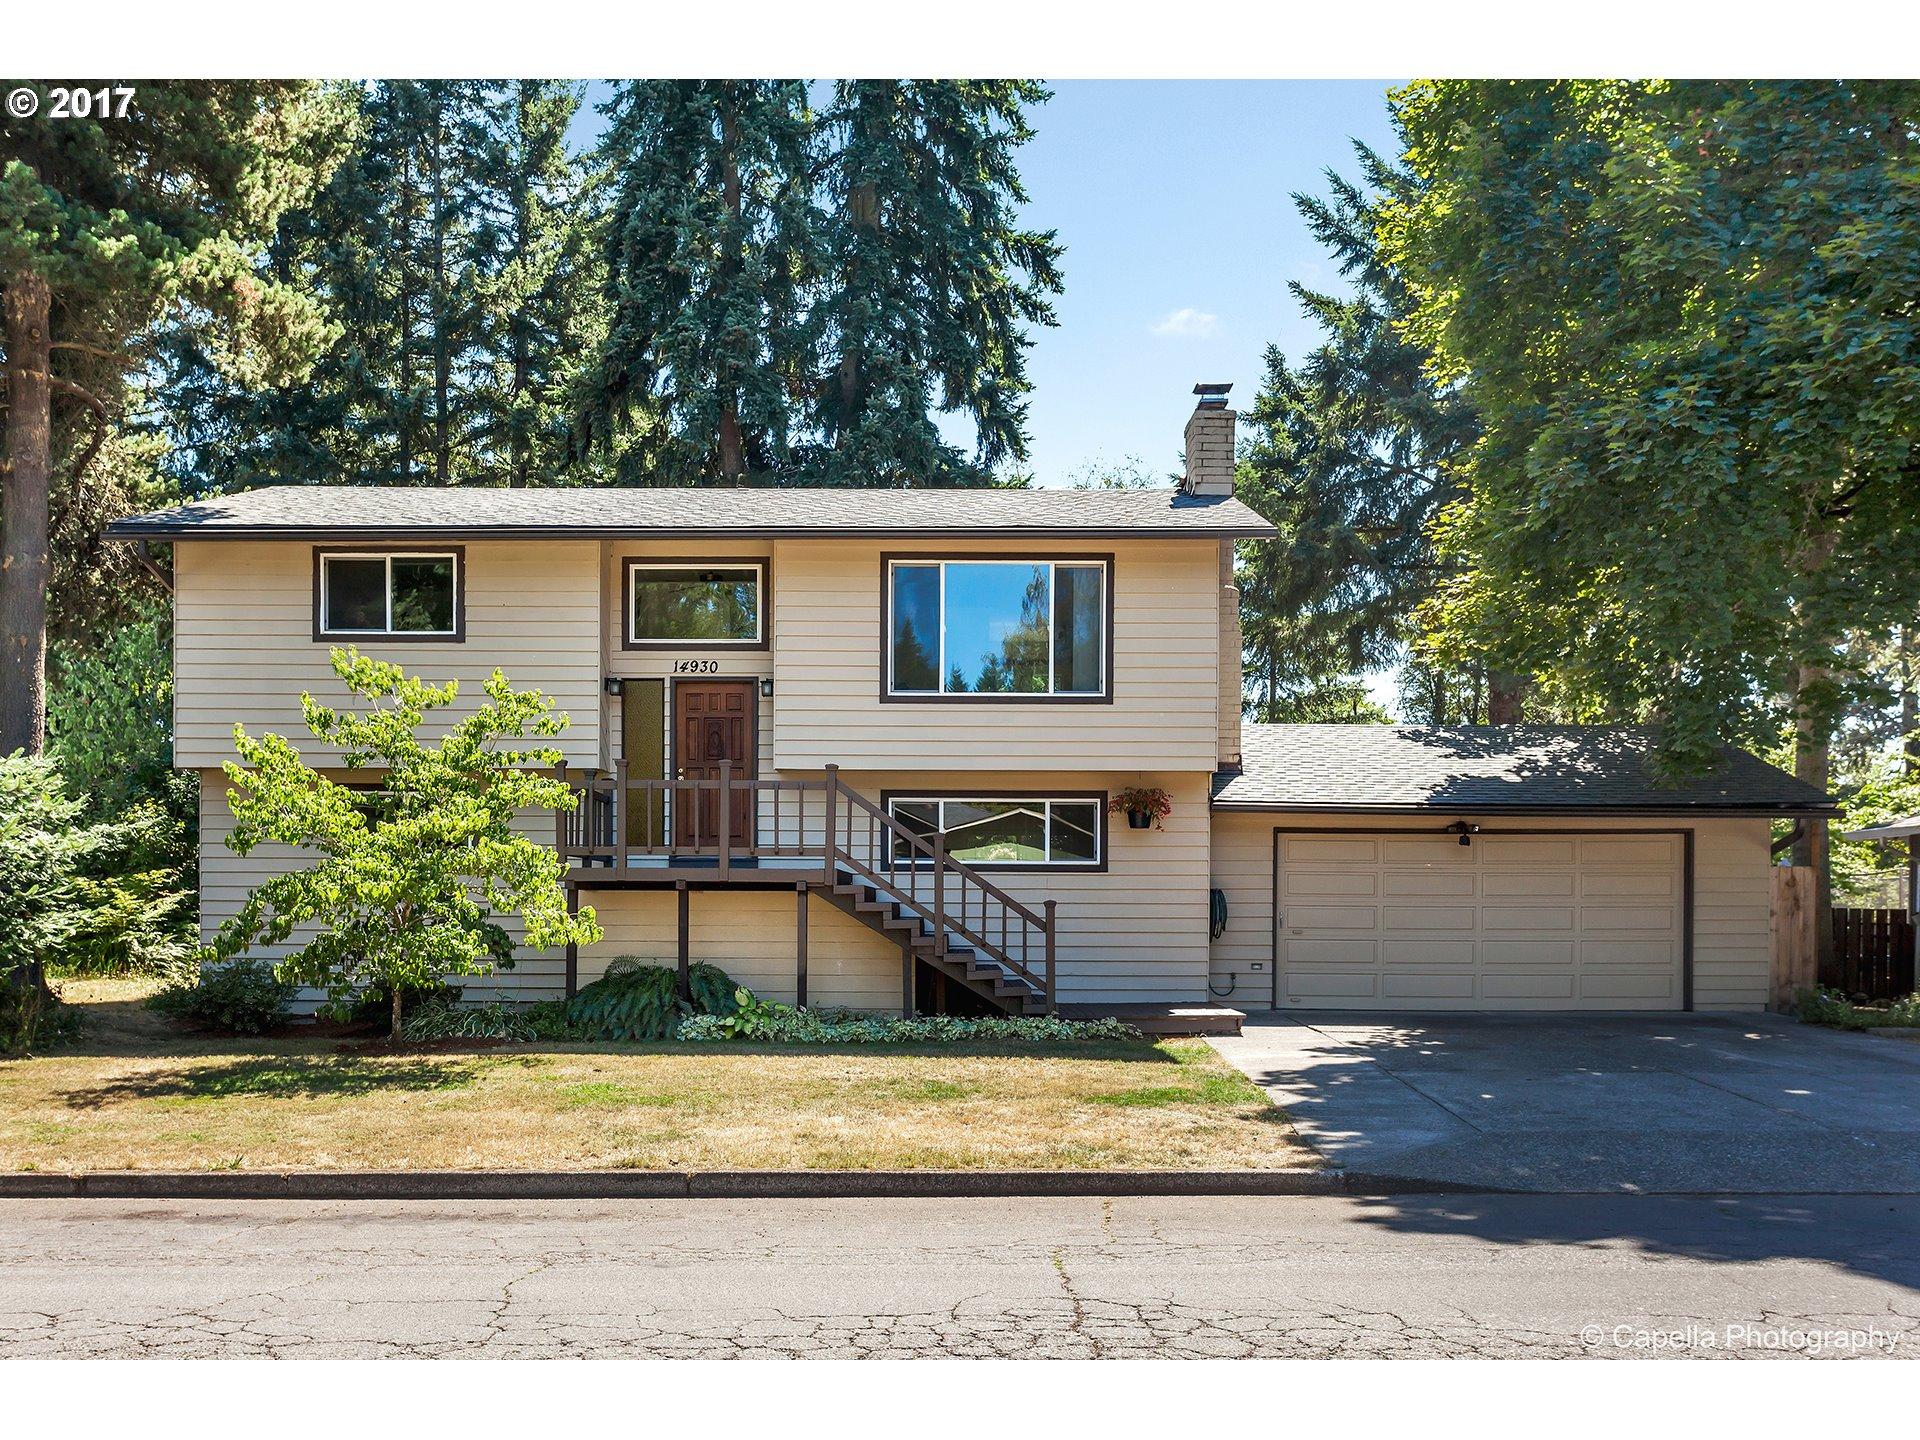 14930 S GREENTREE DR, Oregon City, OR 97045